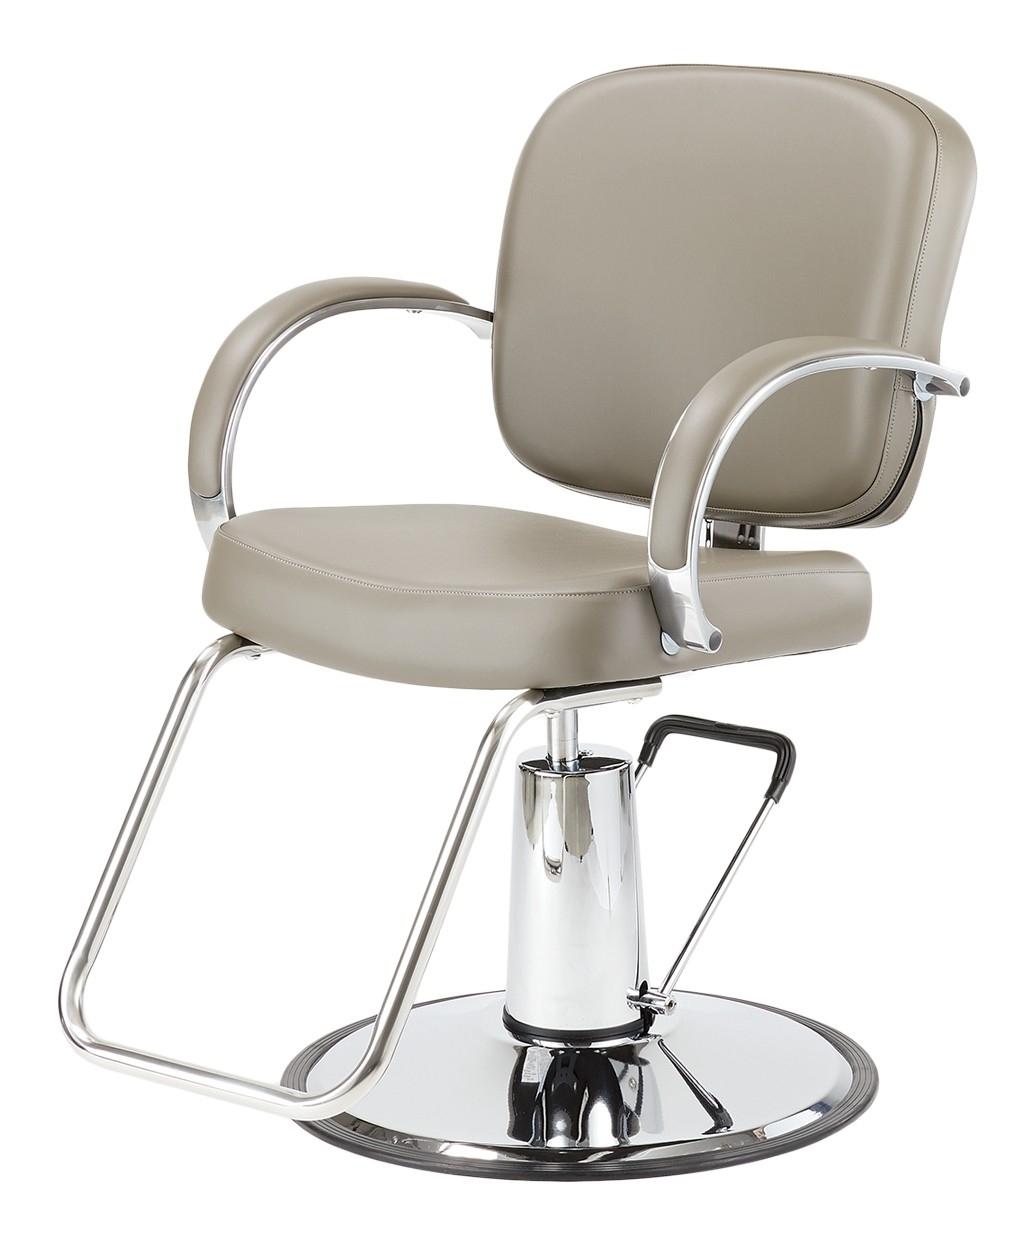 Senior Living Salon Chairs